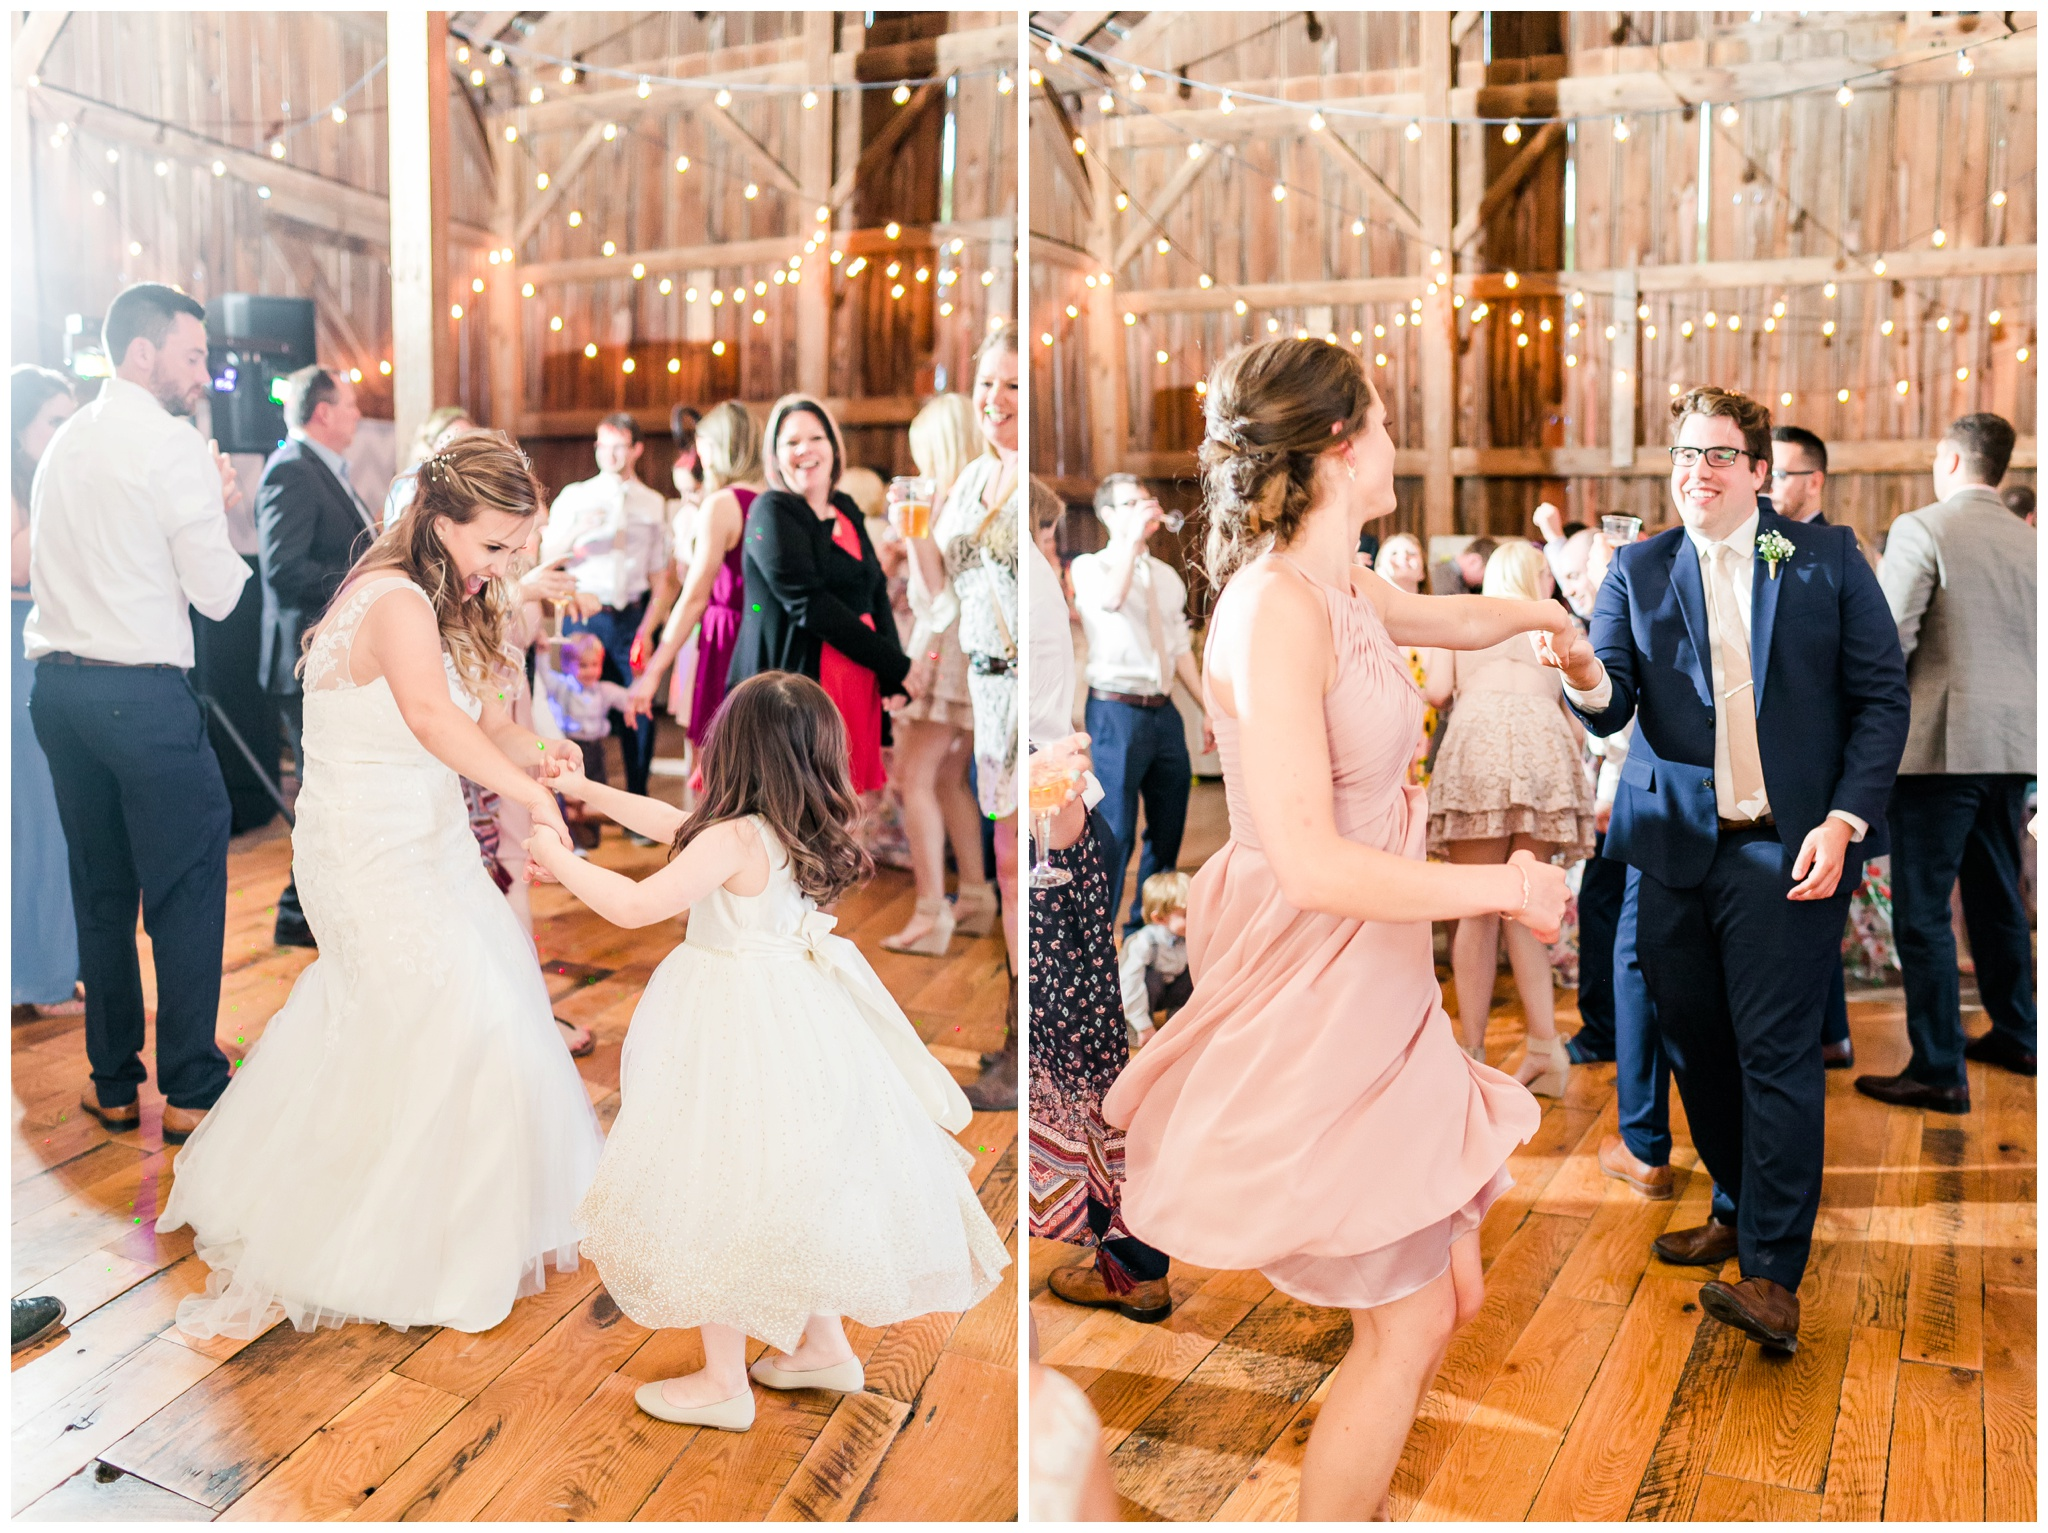 over_the_vines_wedding_edgerton_wisconsin_wedding_caynay_photo_4046.jpg